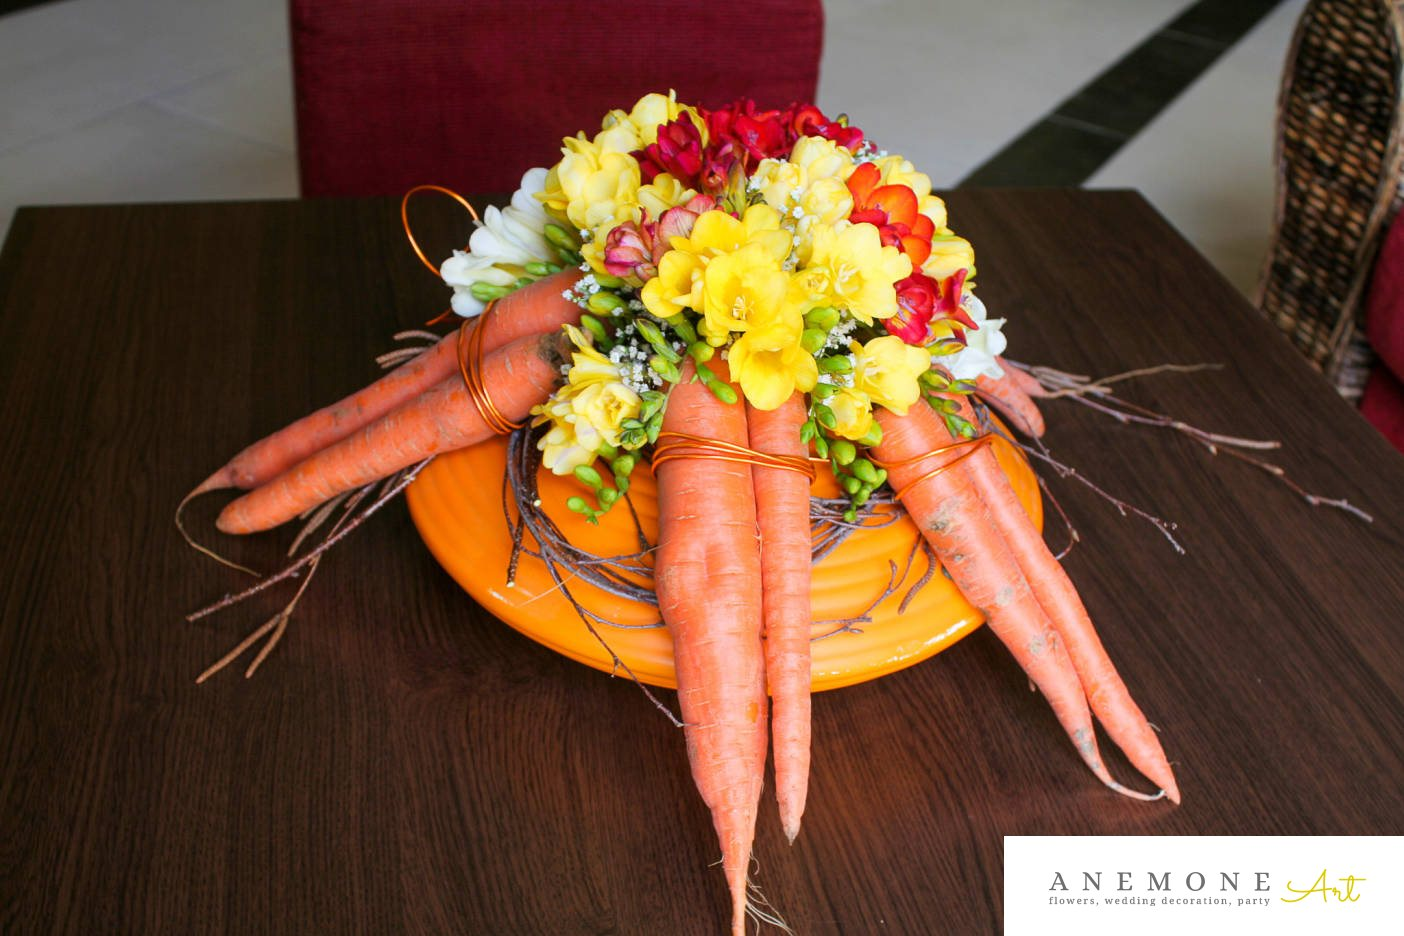 Poza, foto cu Flori de nunta decor masa, frezii, galben, gipsofila, morcovi, portocaliu, rosu in Arad, Timisoara, Oradea (wedding flowers, bouquets) nunta Arad, Timisoara, Oradea